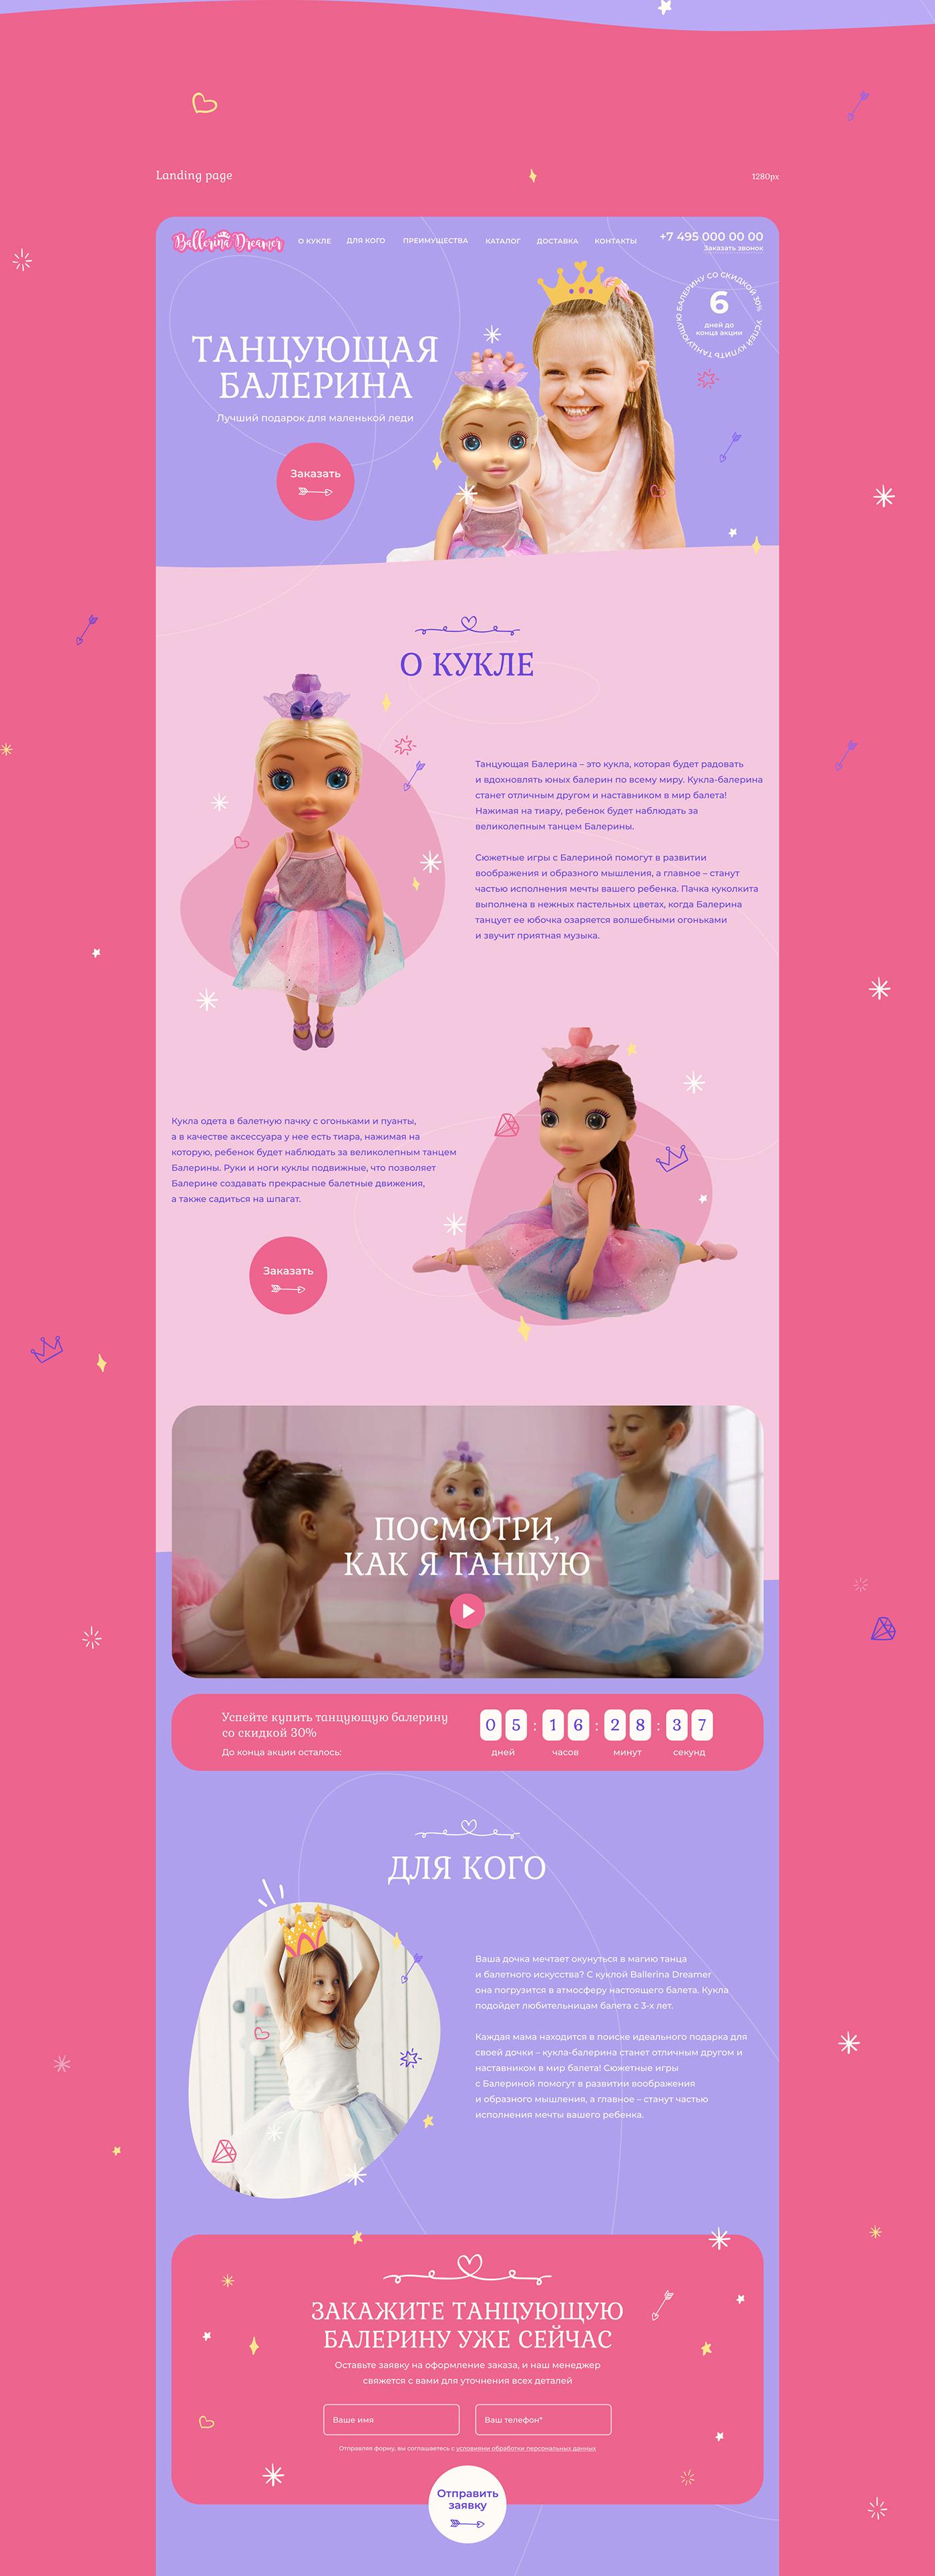 ballerina ballet DANCE   girls kids landing page Style toy UI/UX Web Design